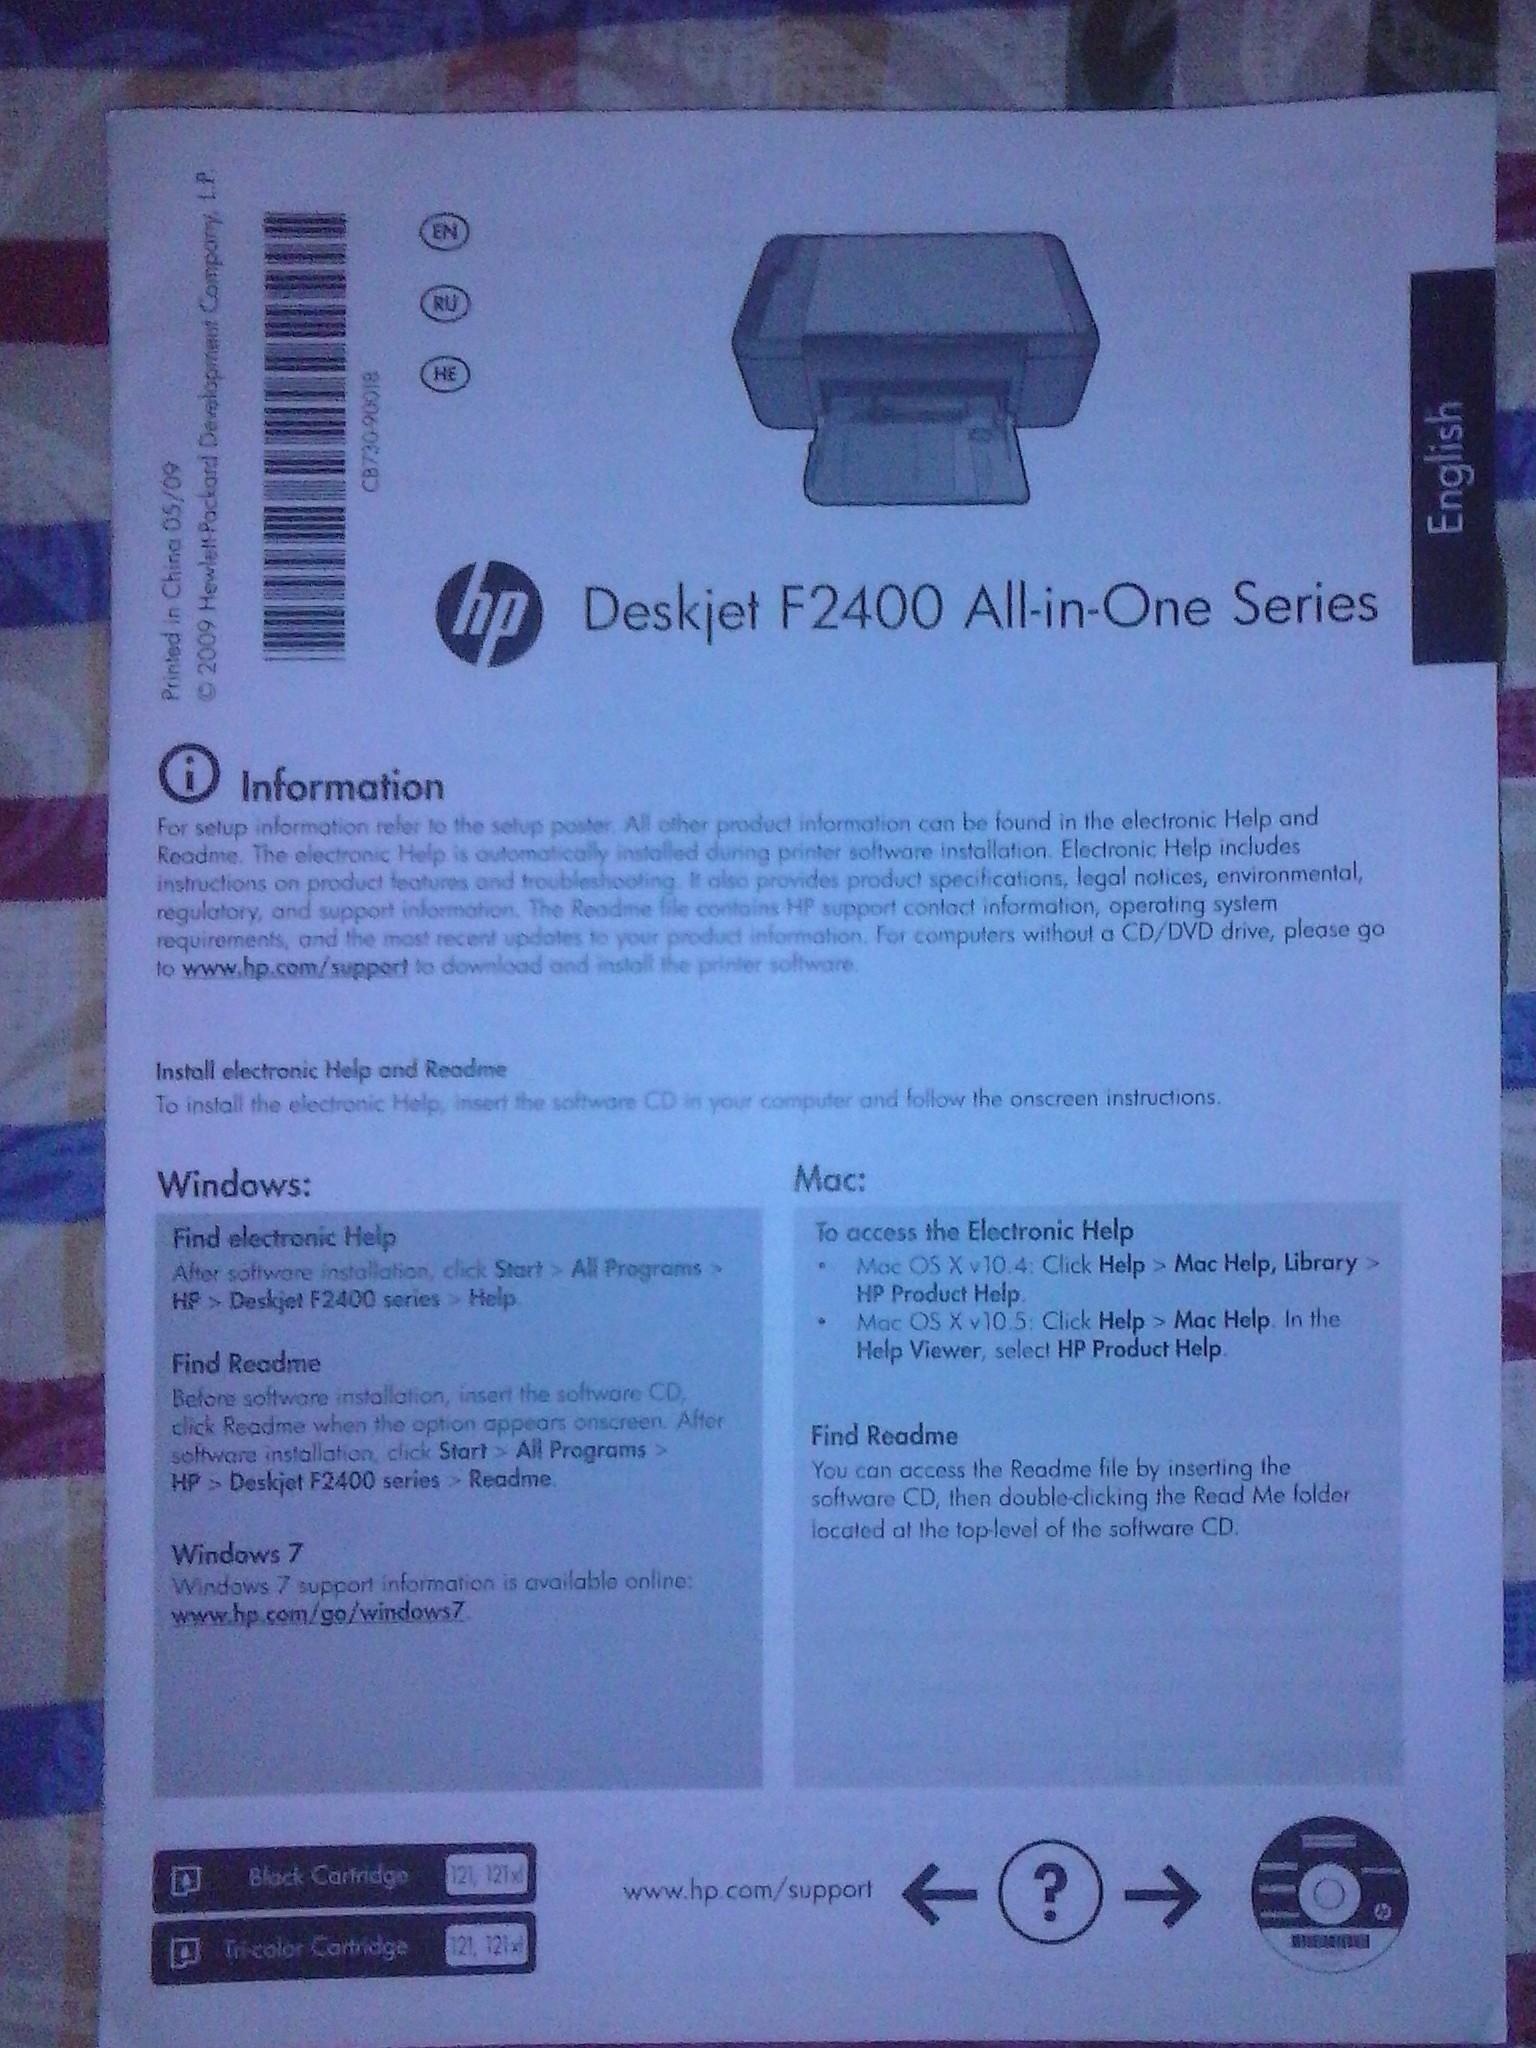 Инструкция к МФУ HP Deskjet F 2400 All- in- One Series